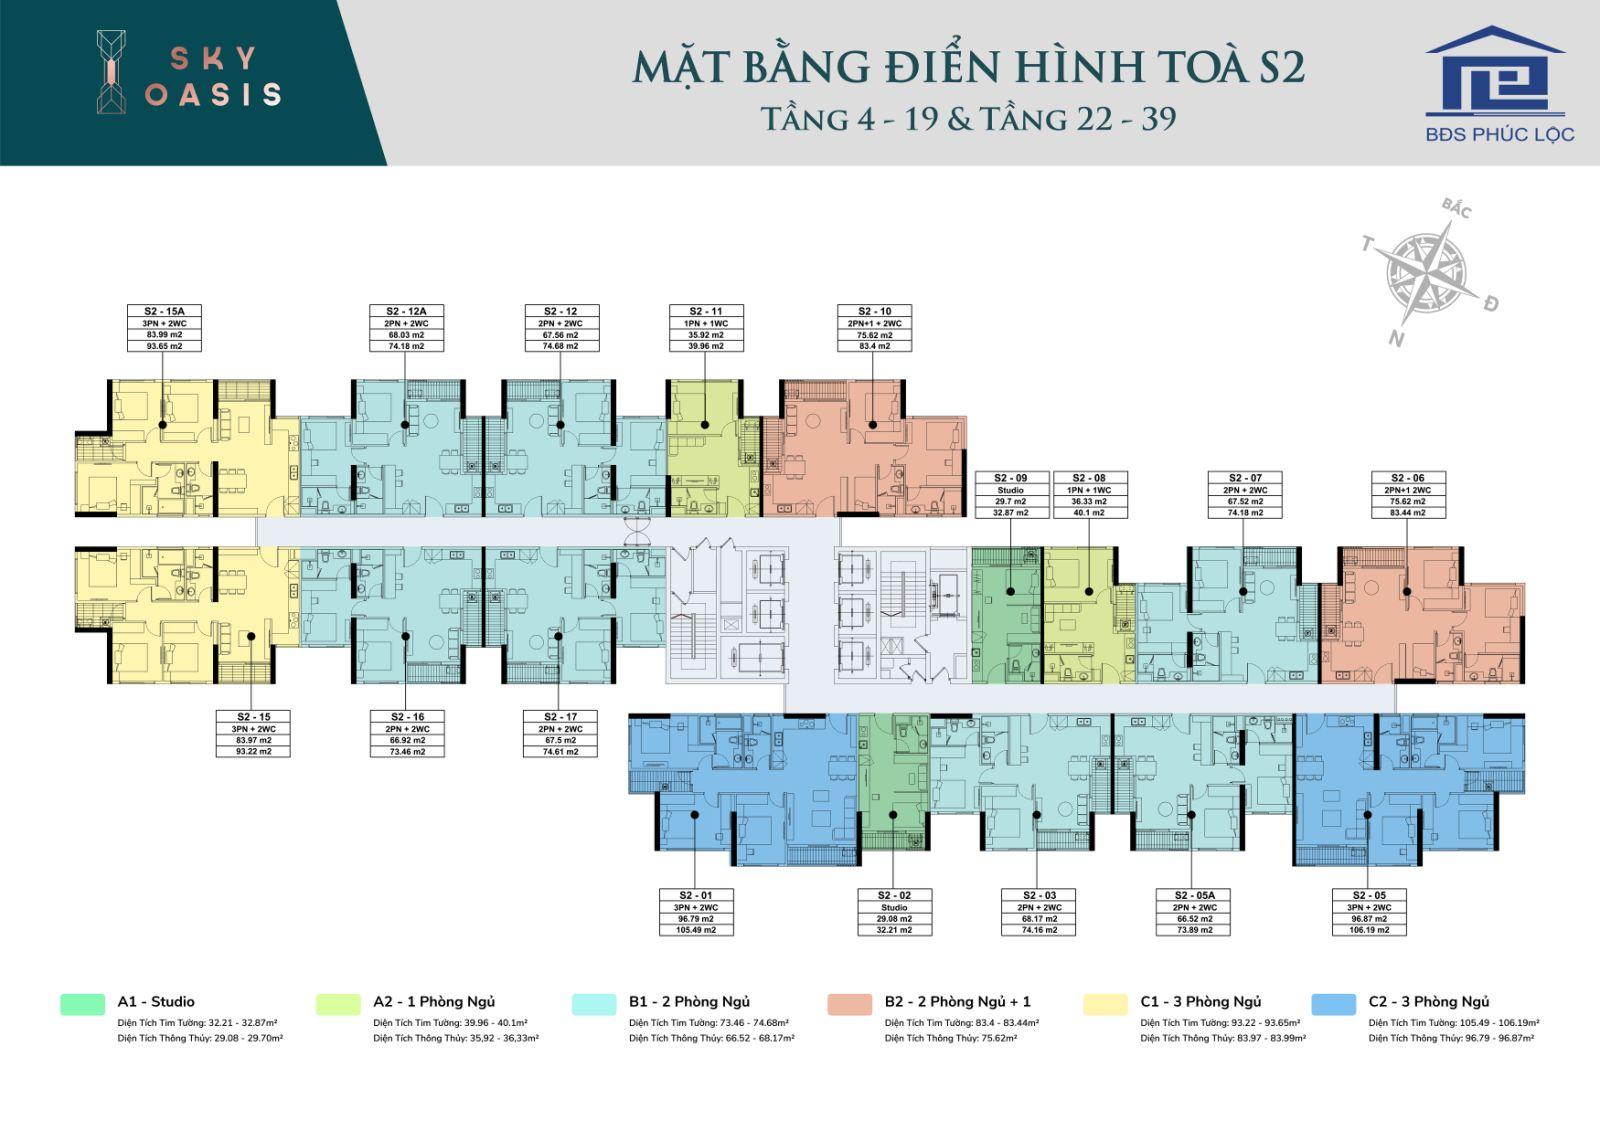 mat-bang-dien-hinh-s2-sky-oasis